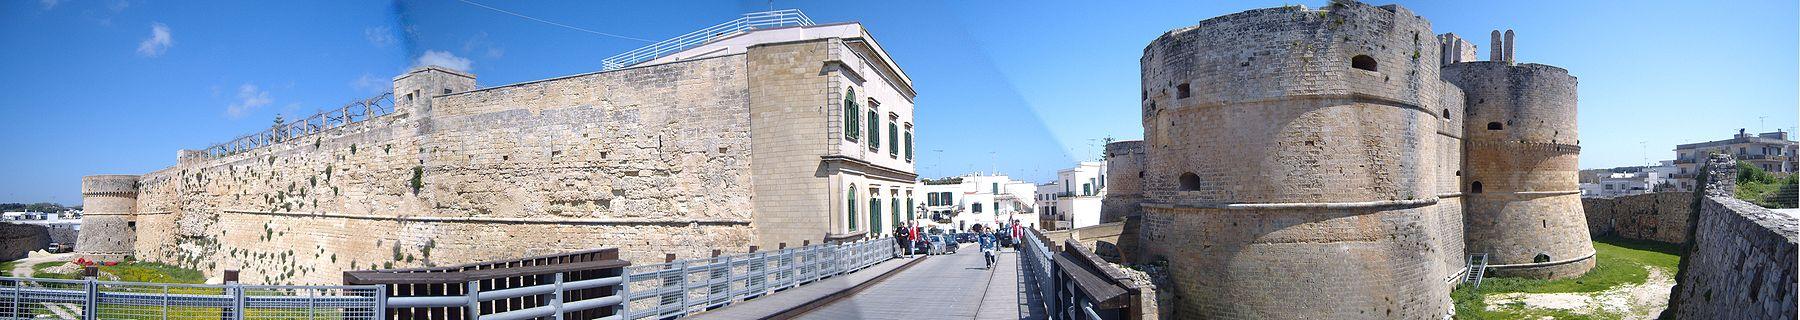 Otranto castello panorama.jpg